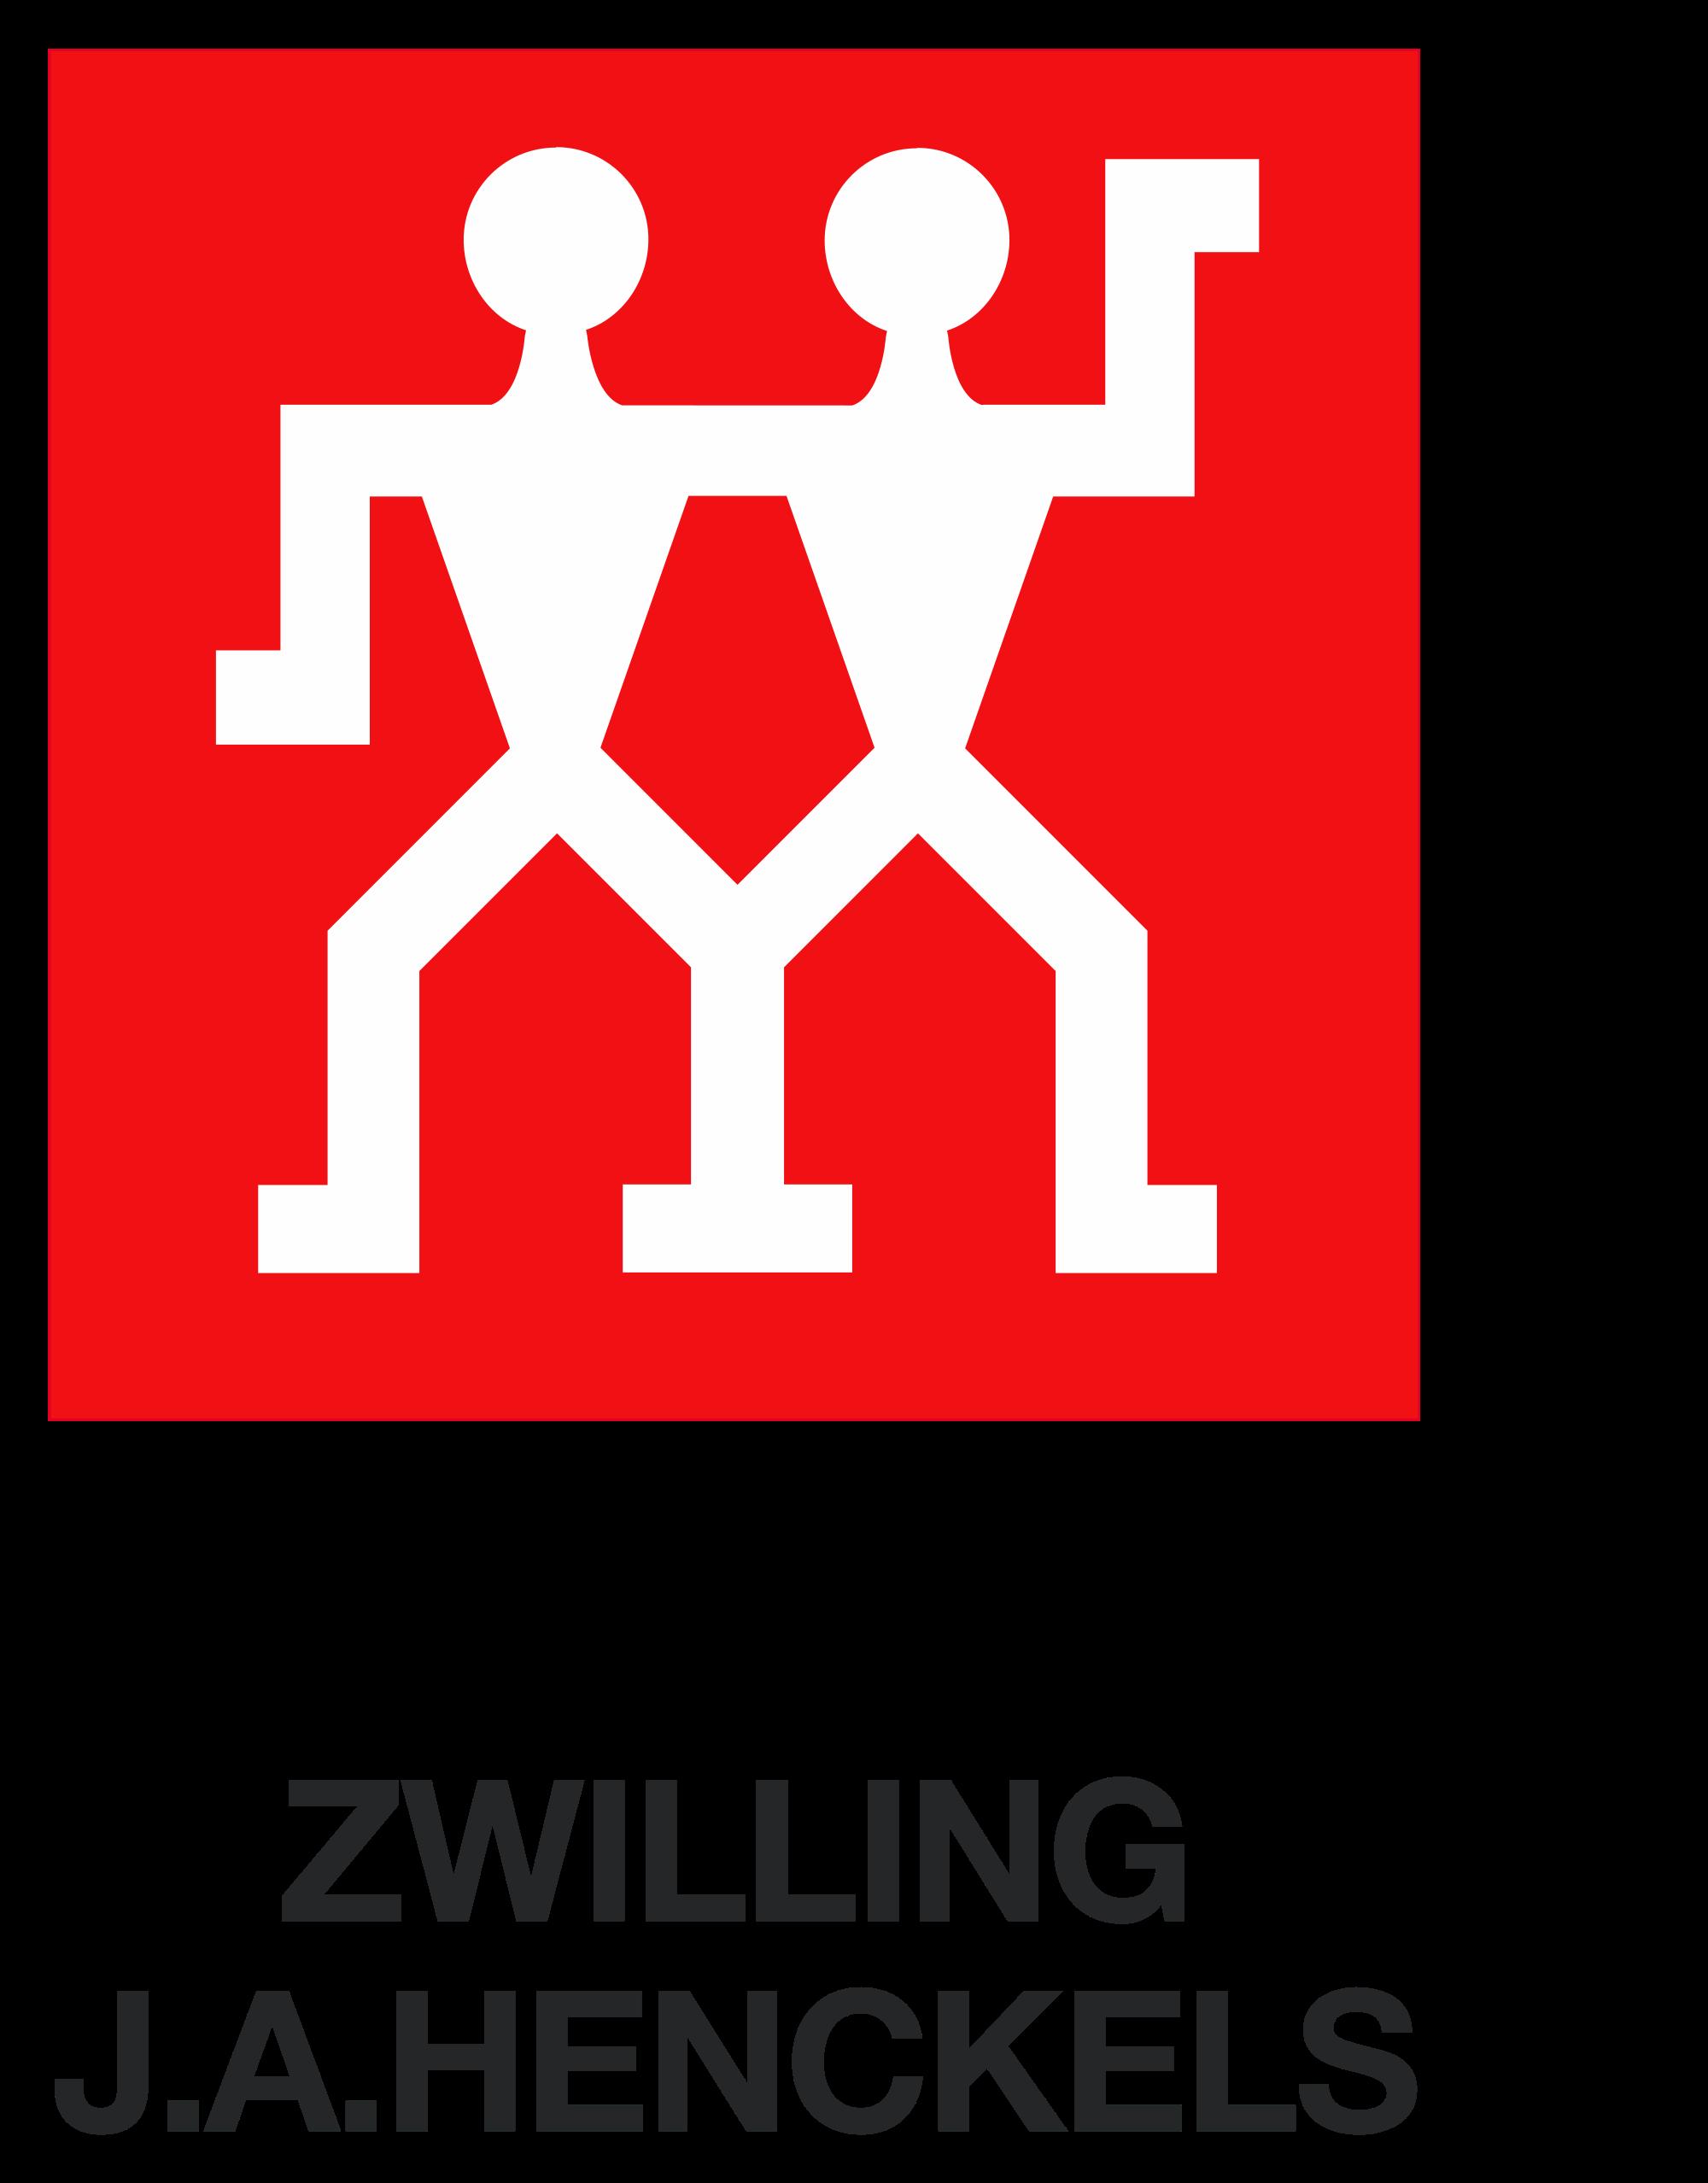 zwilling j. a . henckels